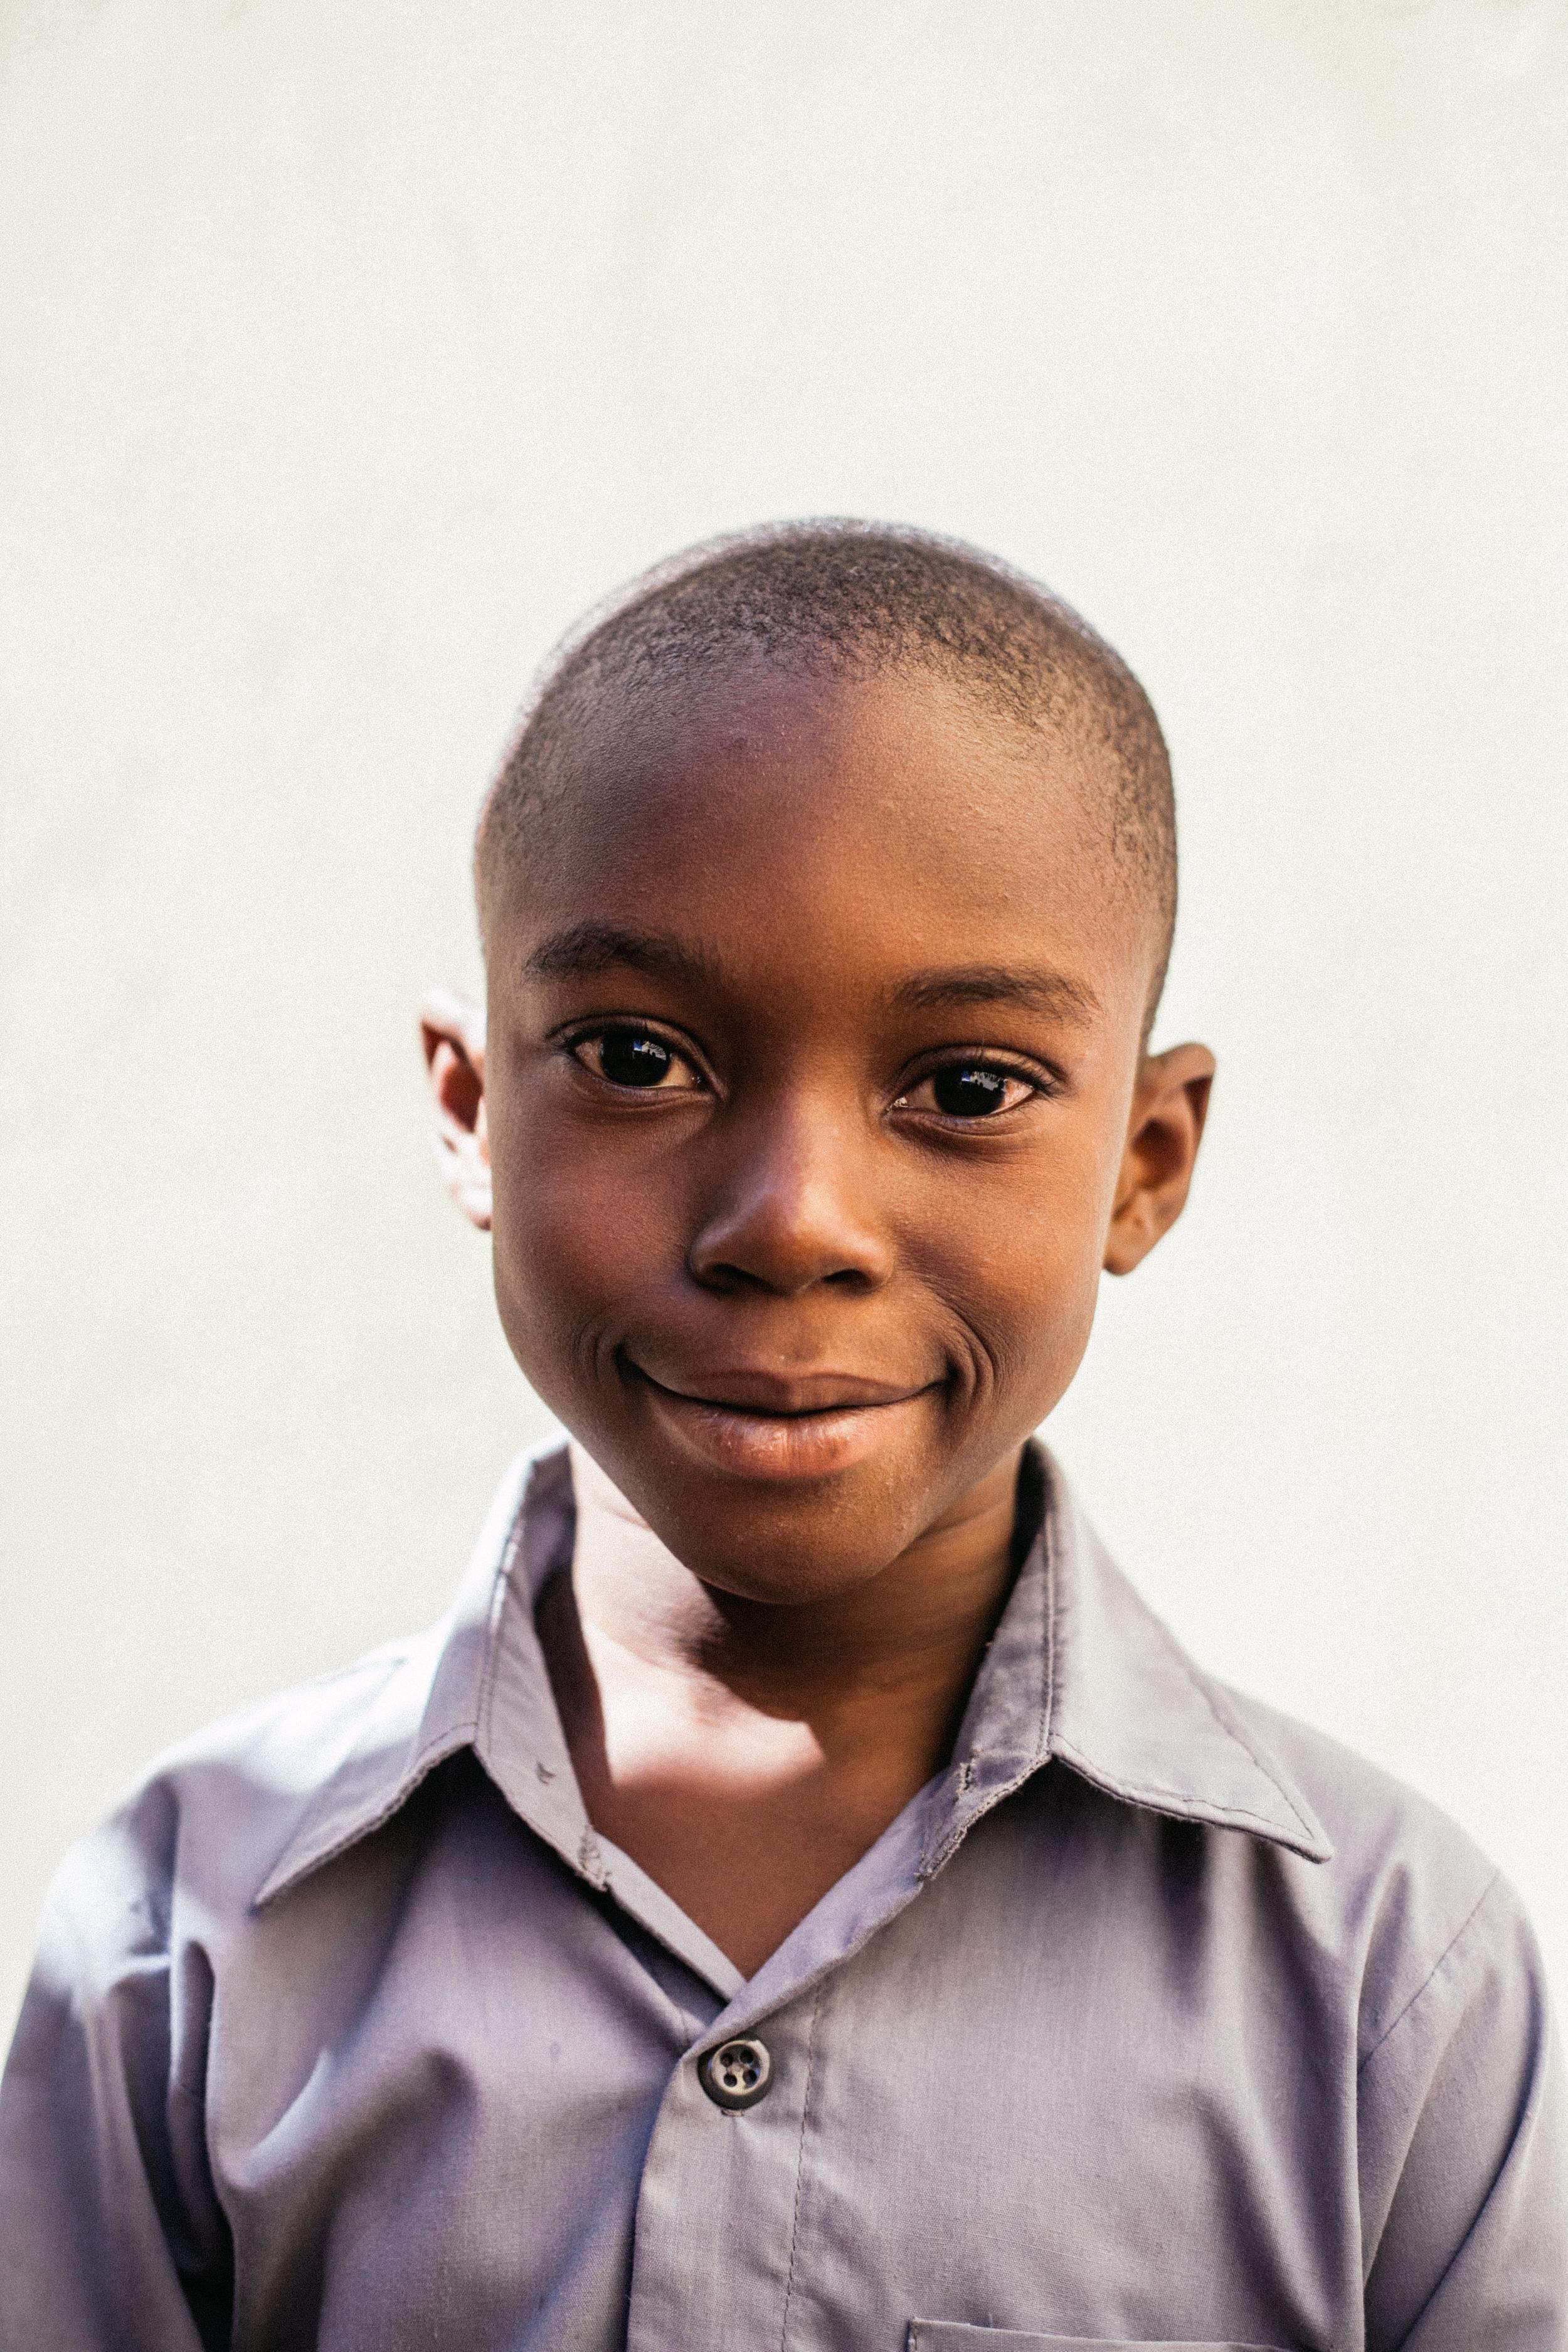 Haiti5starslores155.jpg